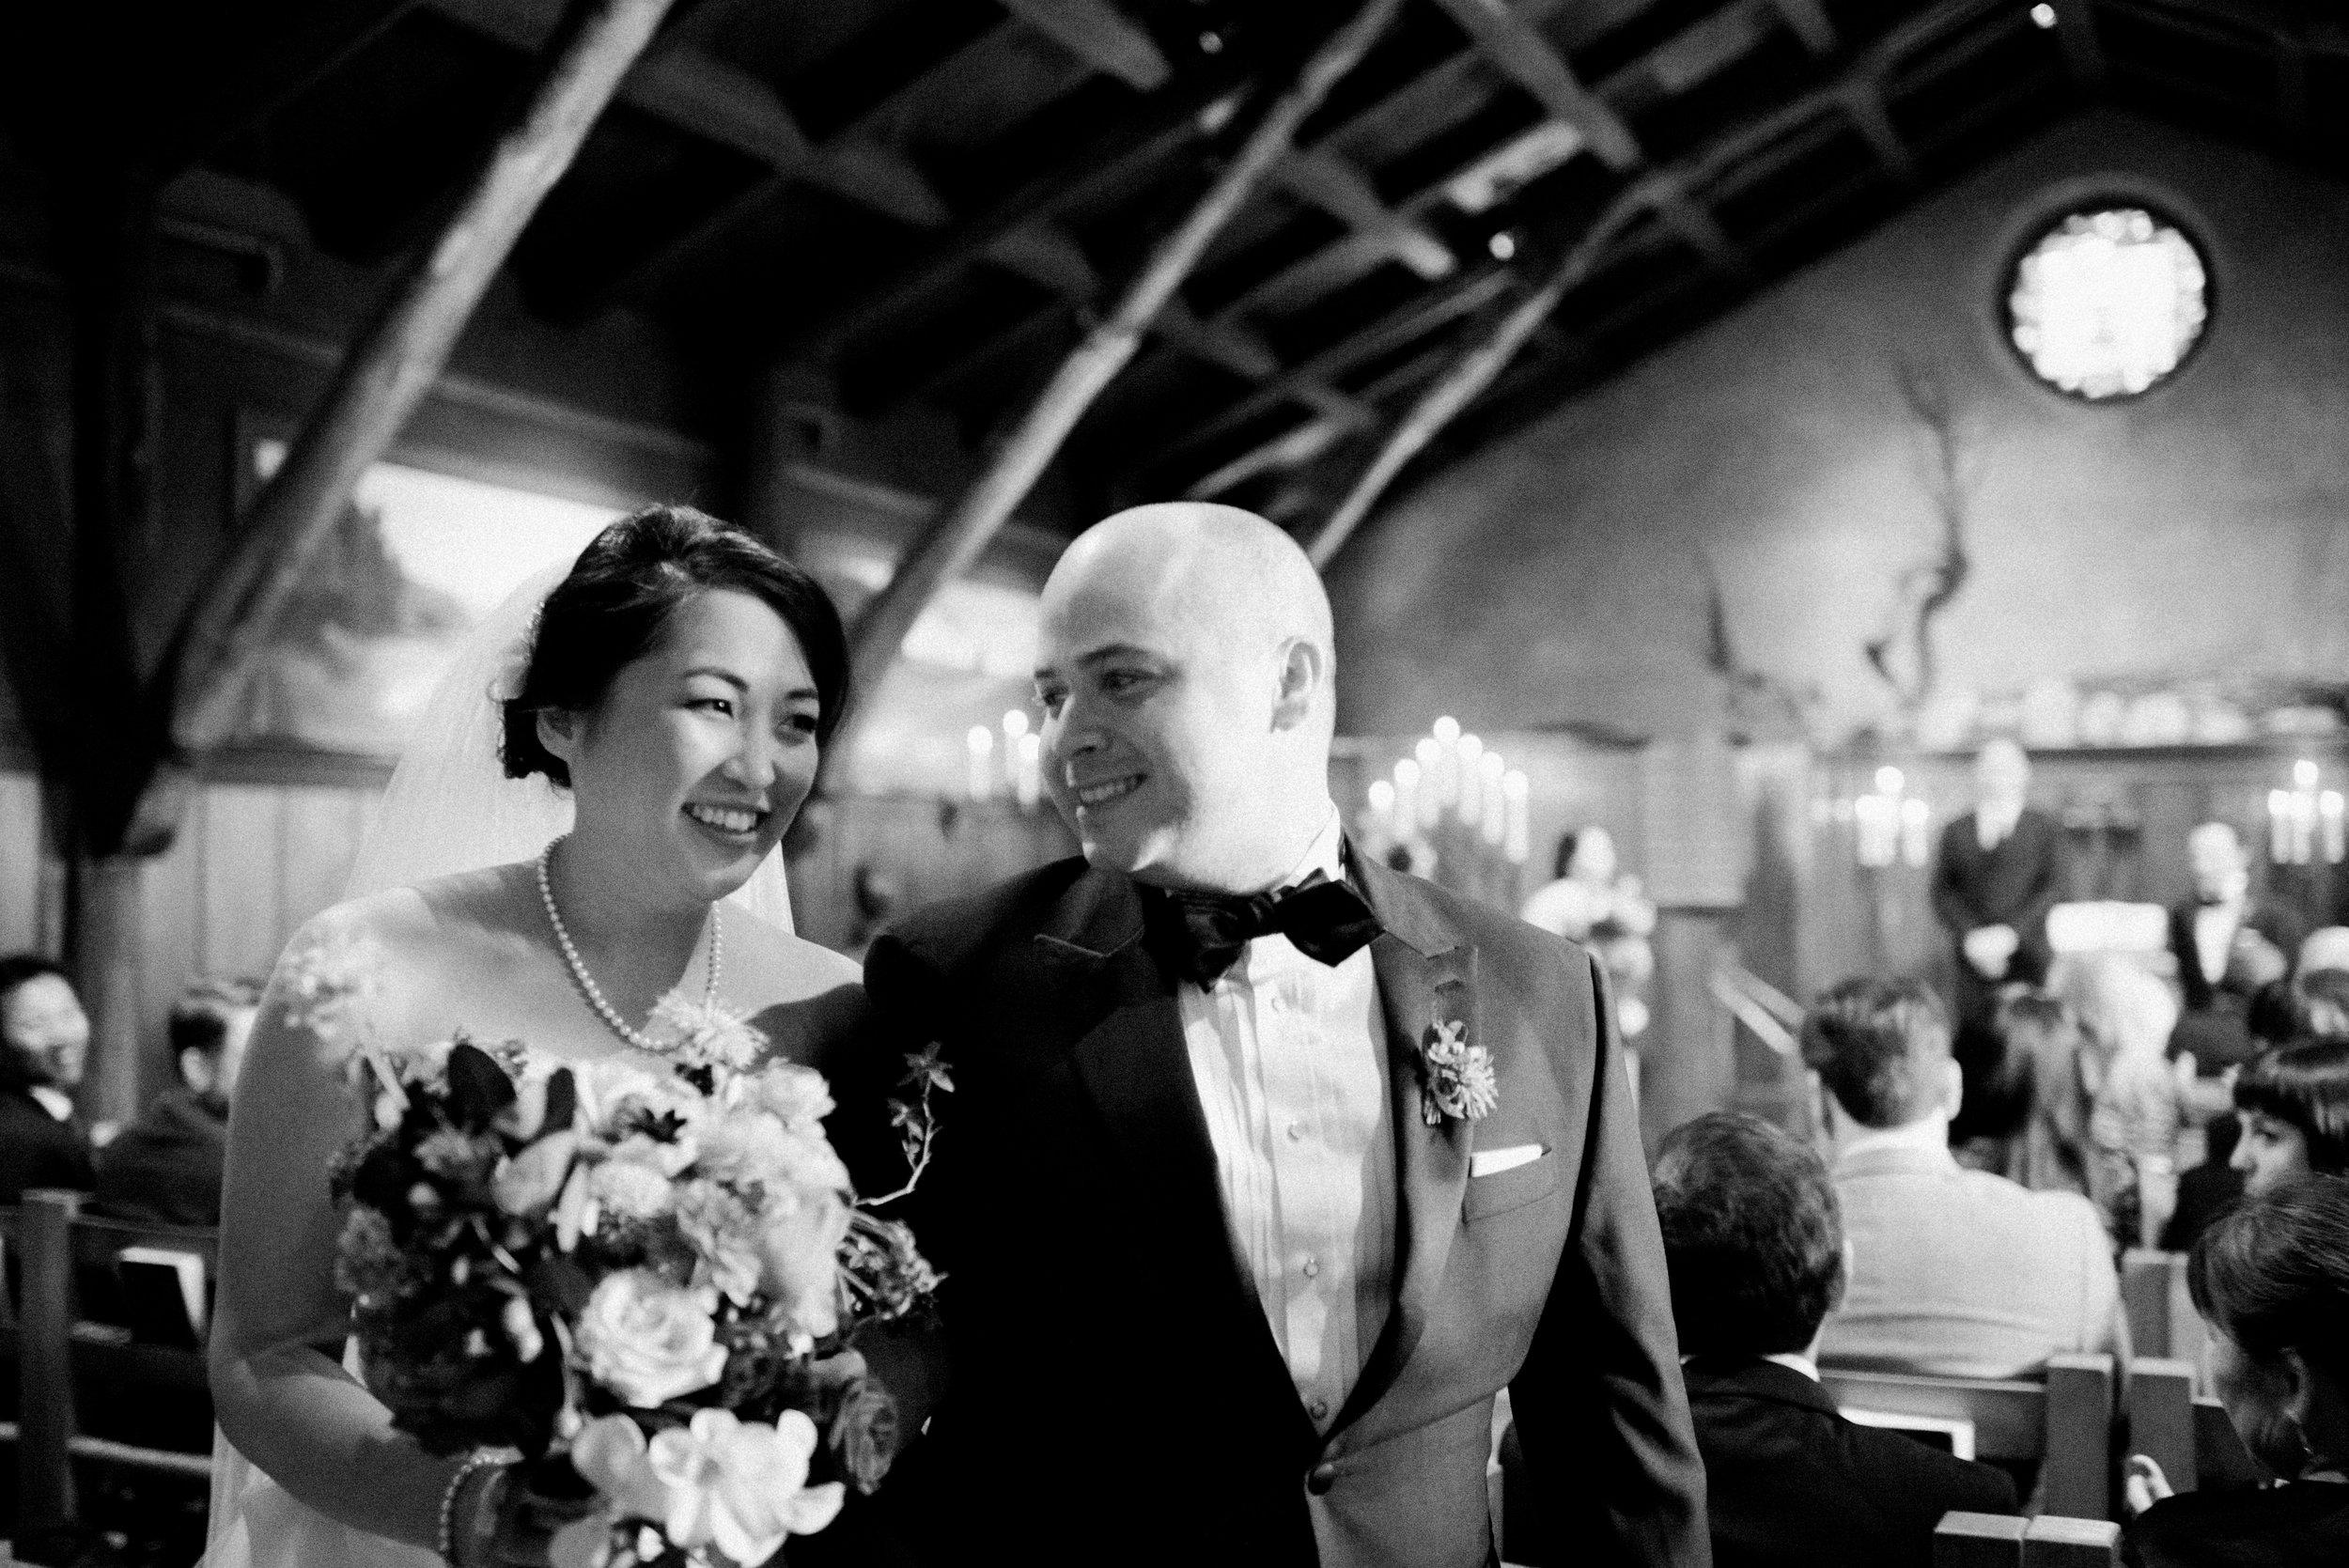 Swedenborgian Church Dogpatch Winery Wedding032.jpg